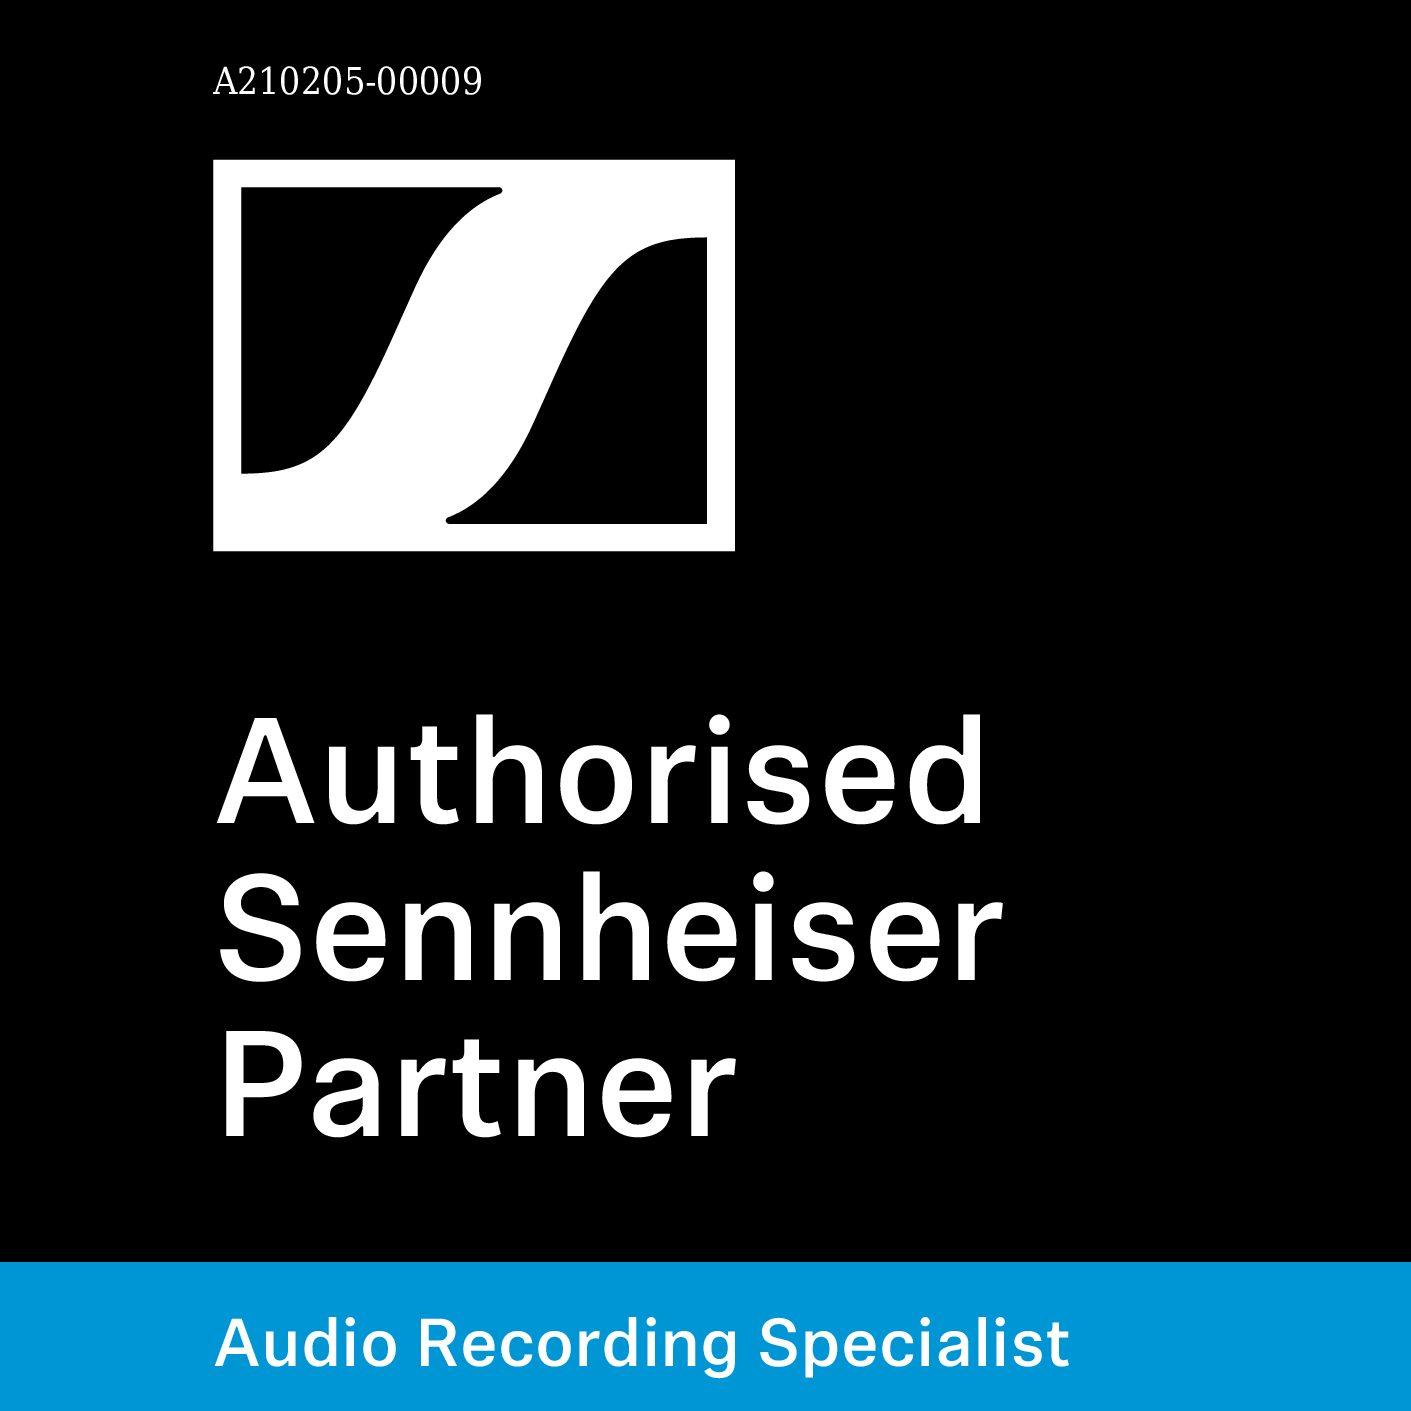 Sennheiser Audio Recording Specialise